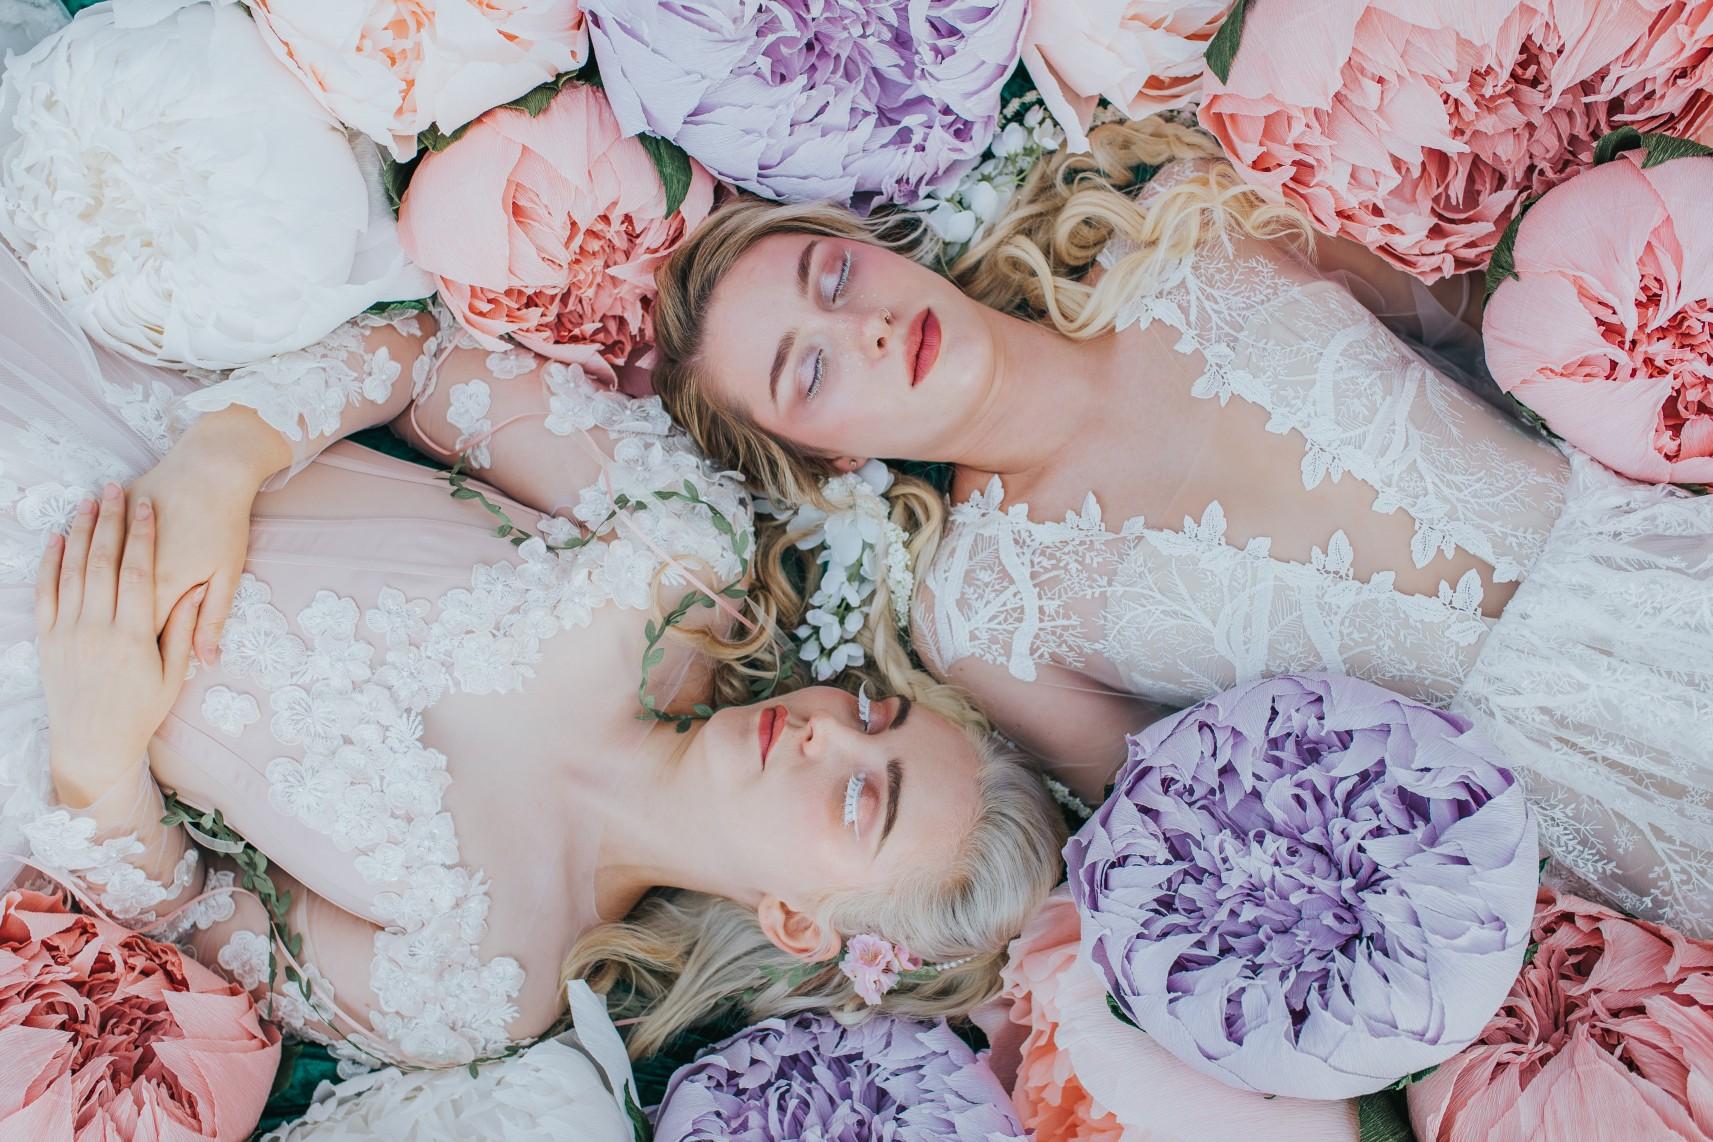 fairy wedding - whimsical wedding - magical wedding - elegant wedding dress - fairytale wedding inspiration